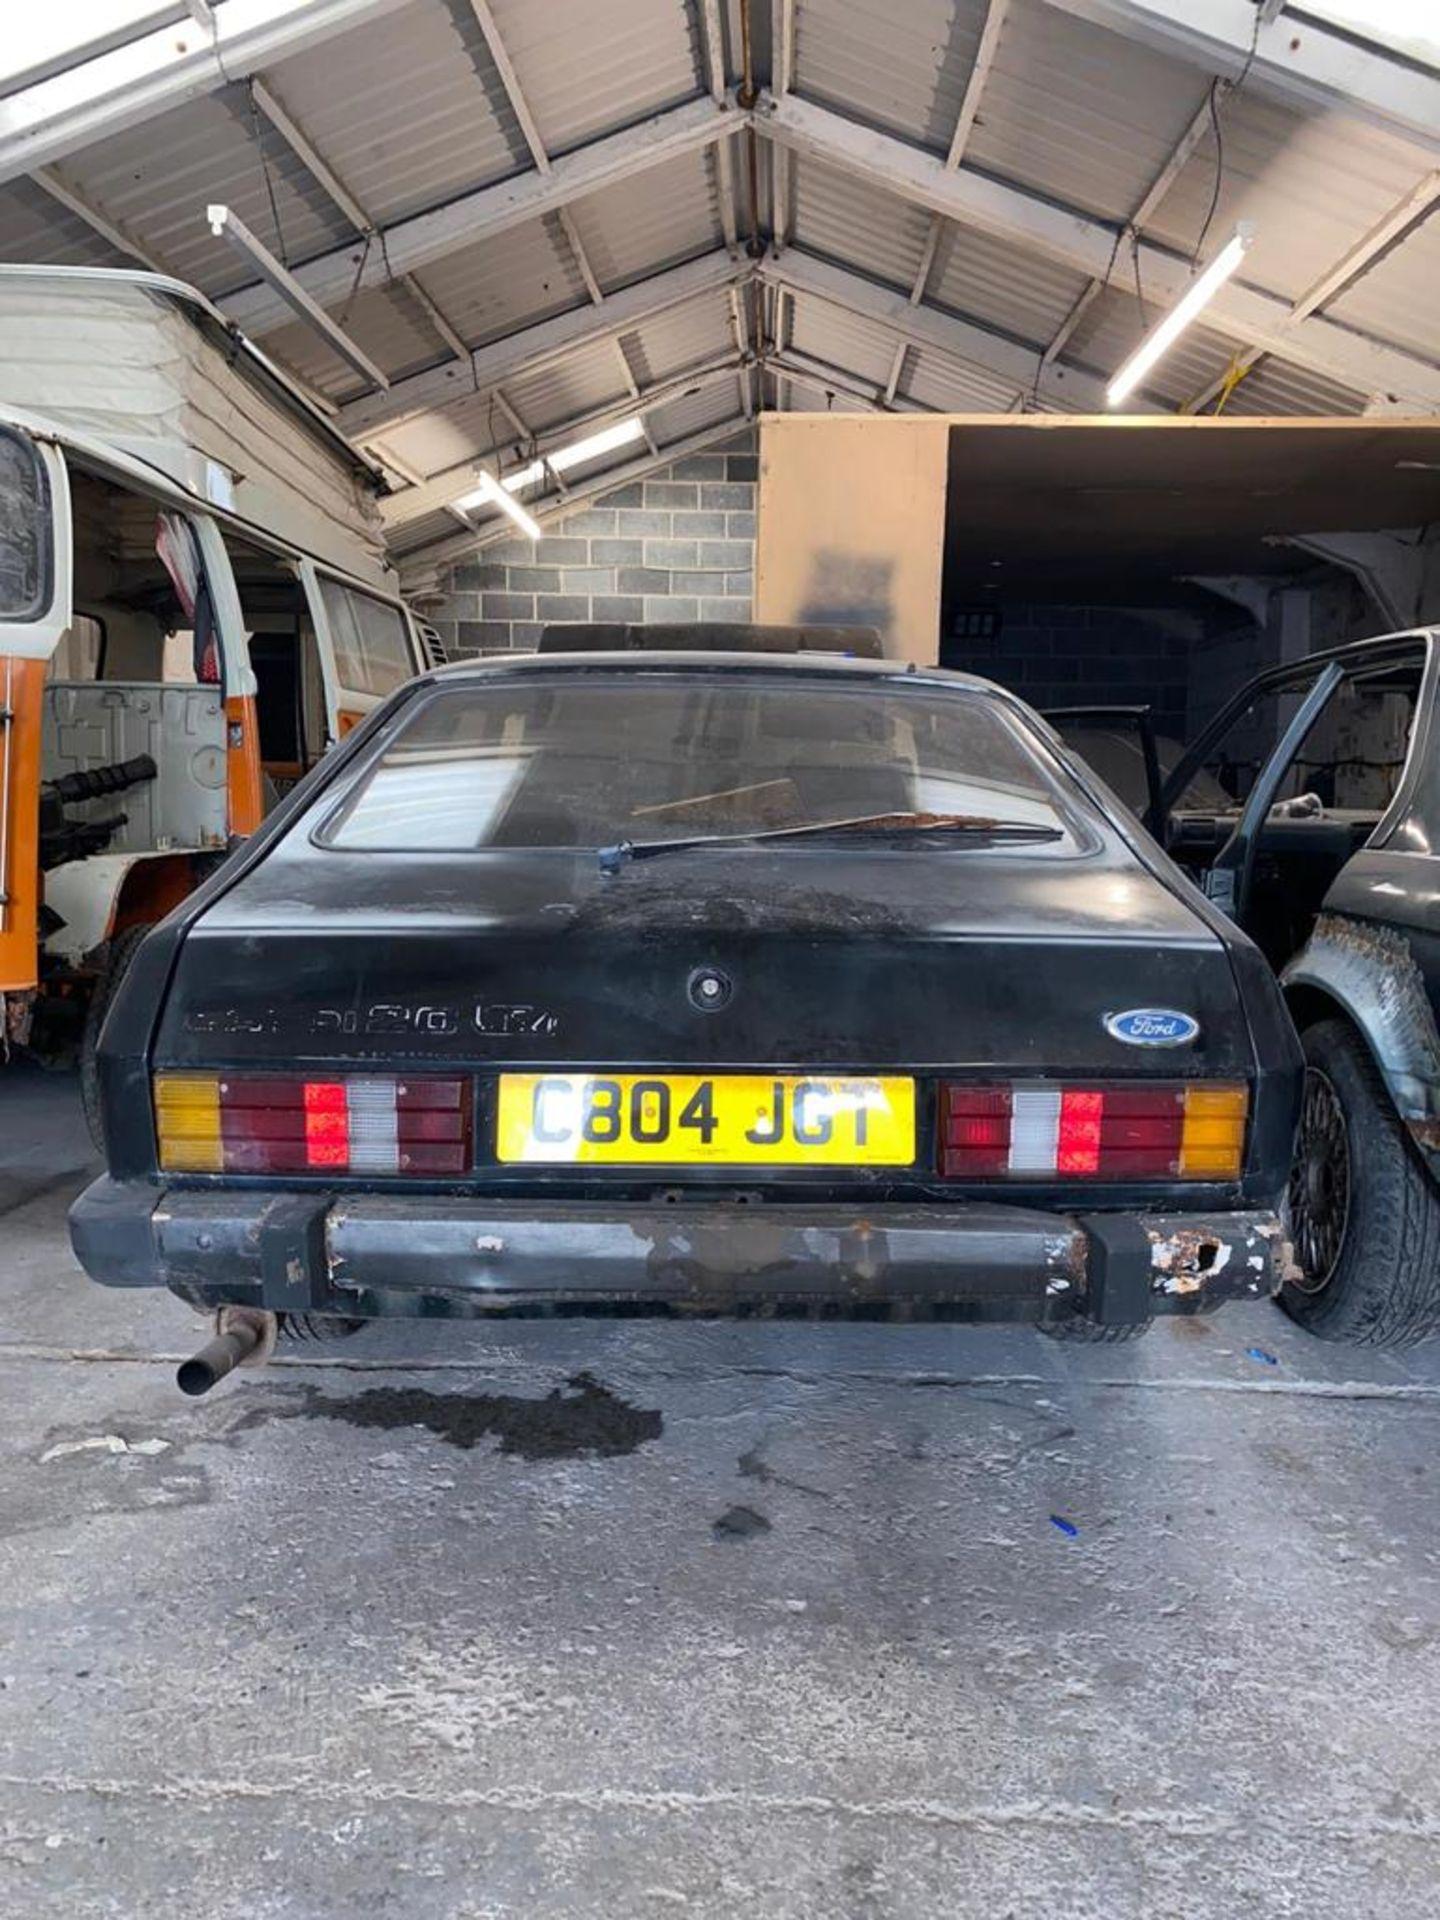 1986/C REG FORD CAPRI LASER AUTO 2.0 PETROL BLACK 3 DOOR *NO VAT* - Image 2 of 32